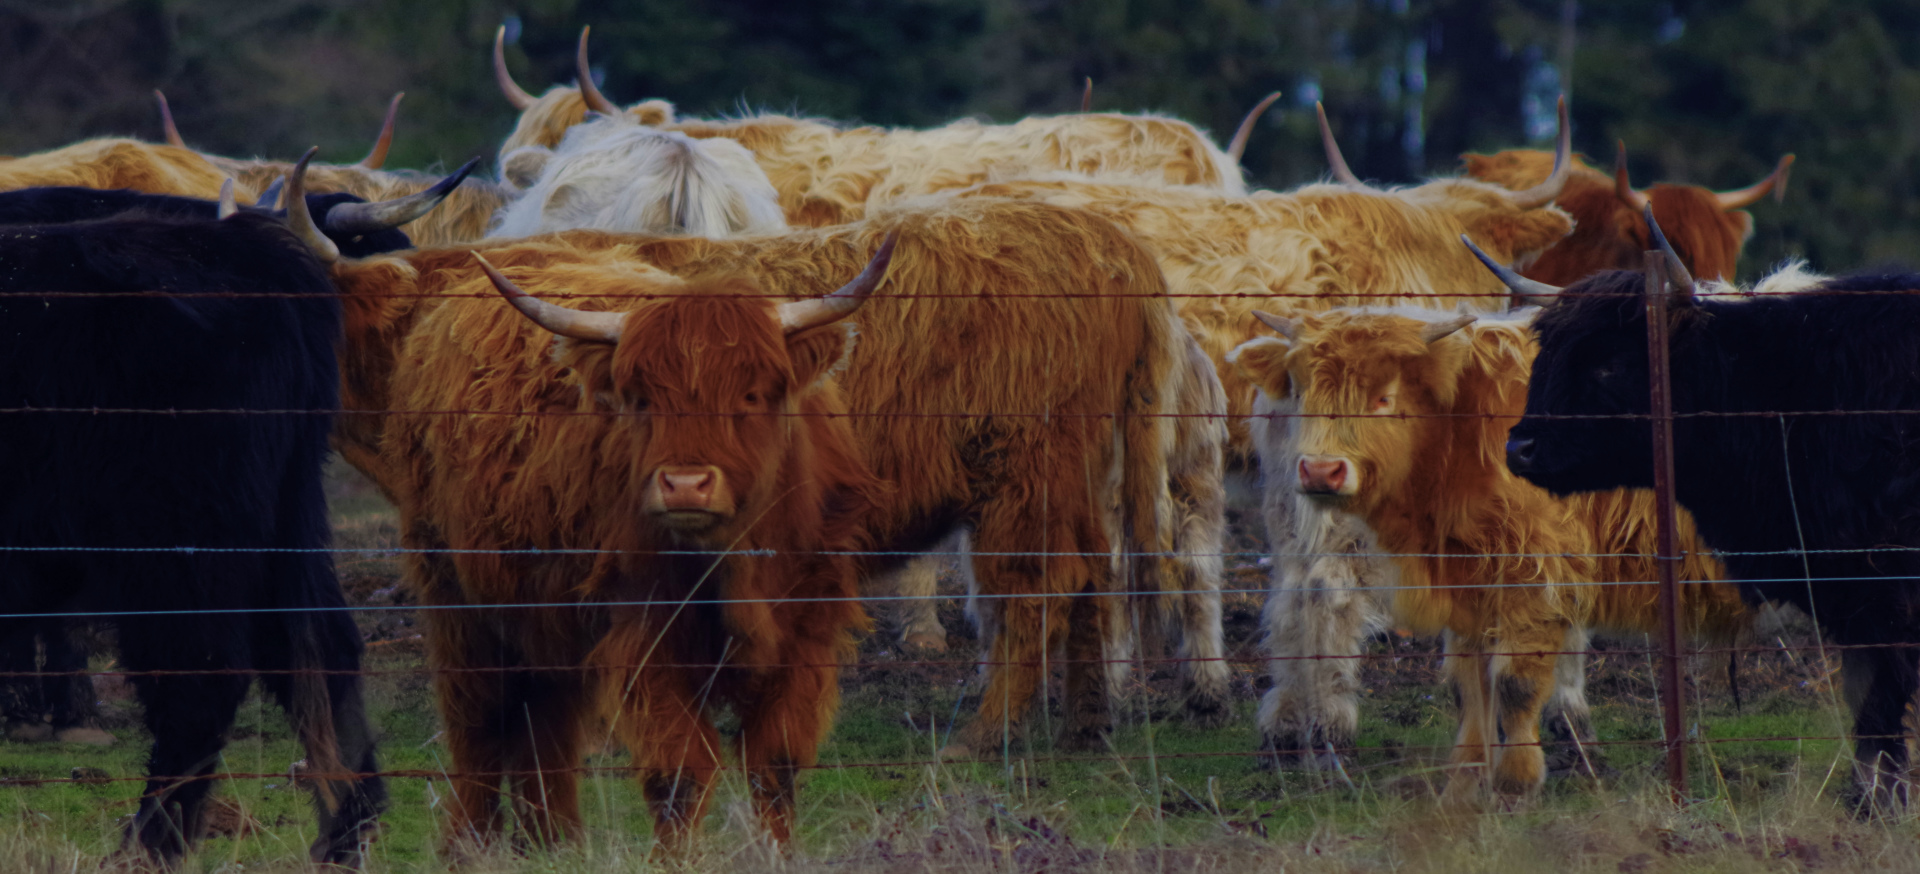 2016-01-03-highland-cattle-1